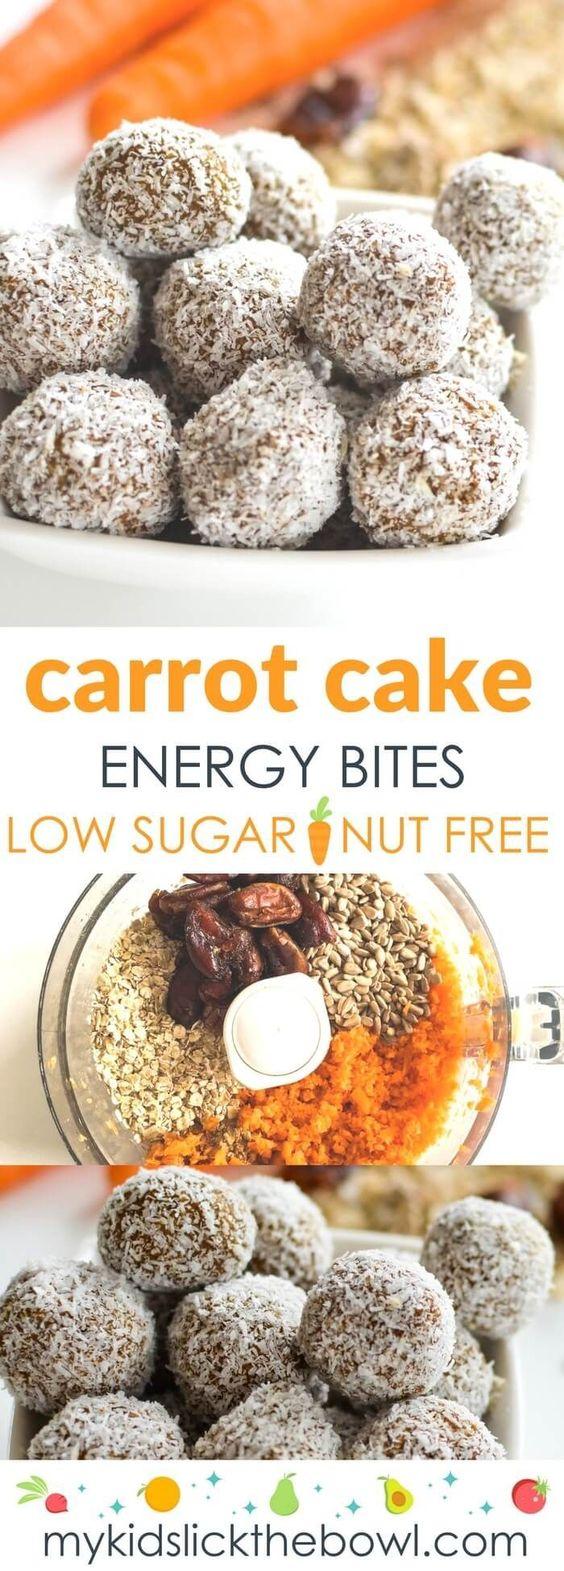 Baby Food Recipe: Blueberry Oats and Yogurt Baby Food Recipe: Blueberry Oats and Yogurt new images